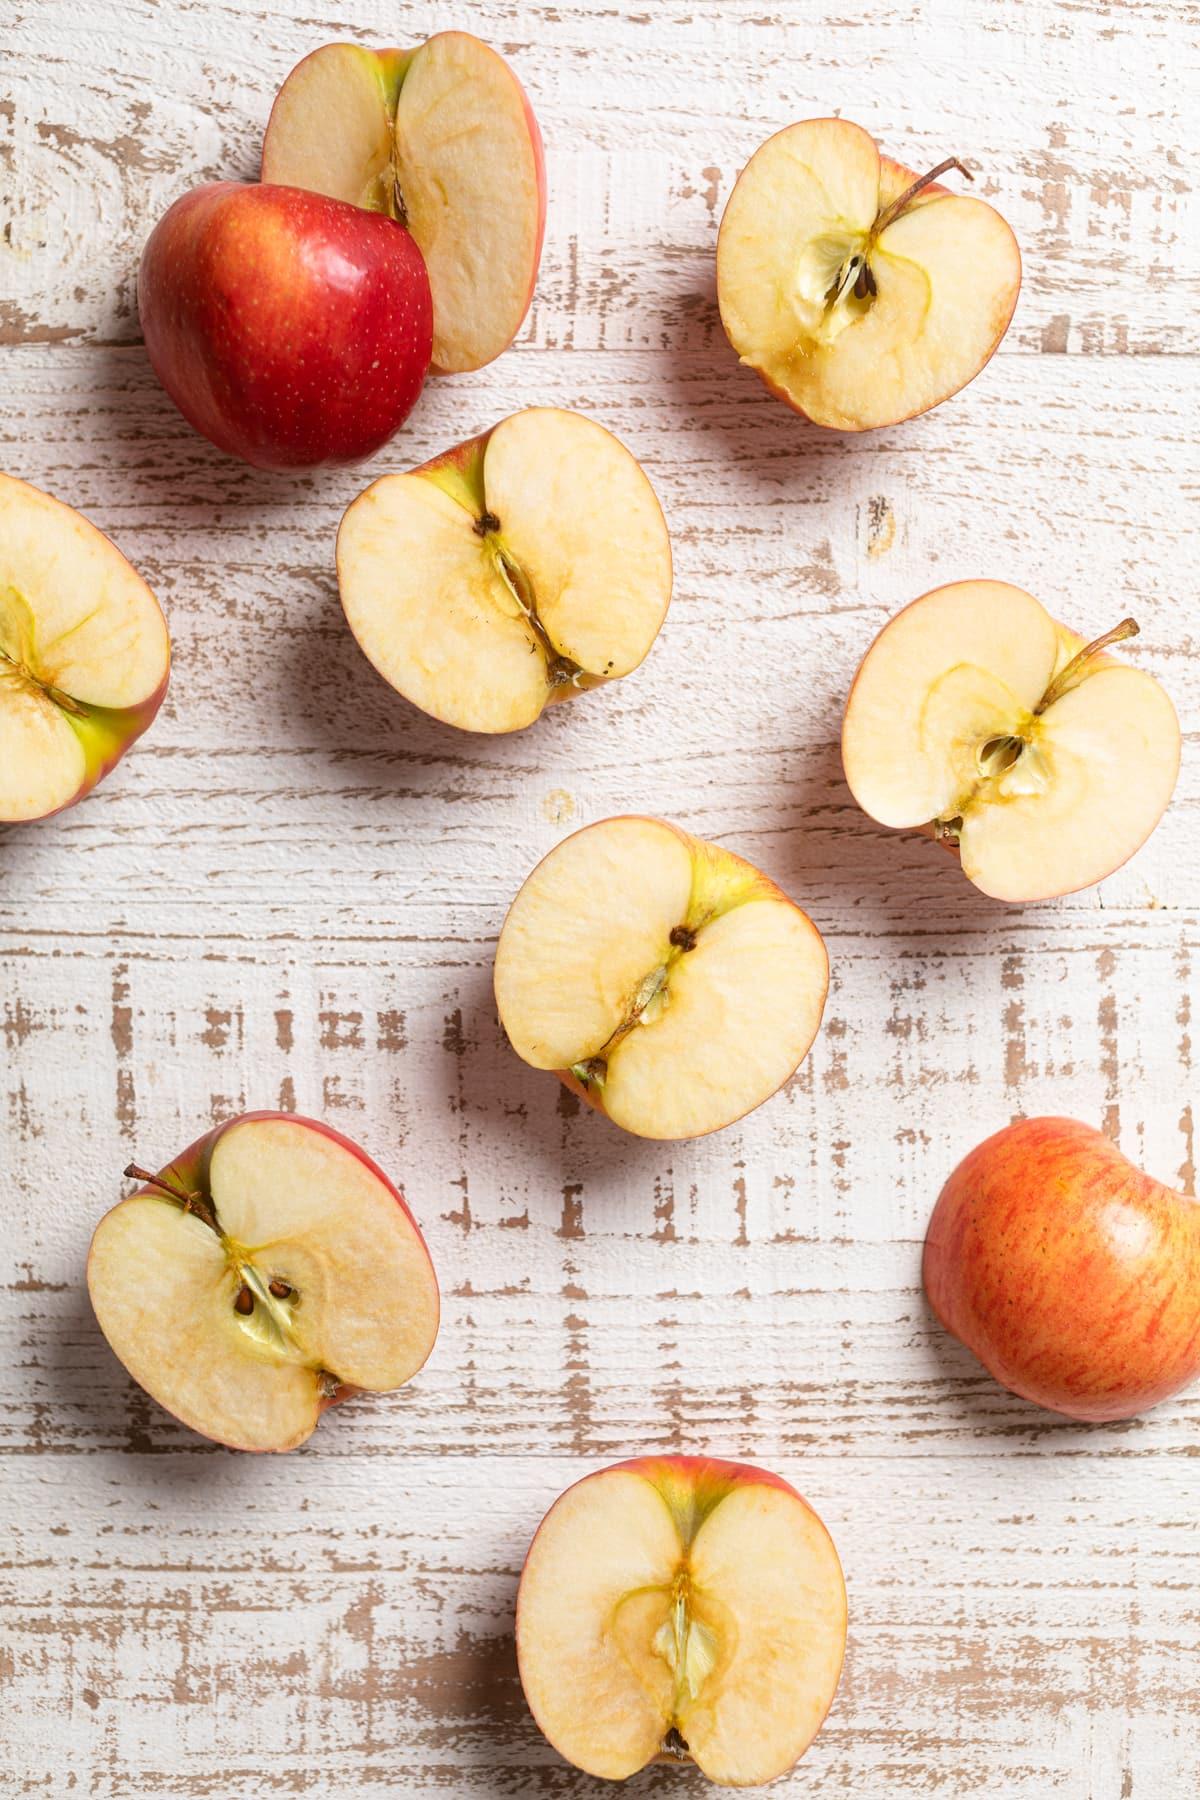 Vegan Baked Cinnamon Caramel Apples